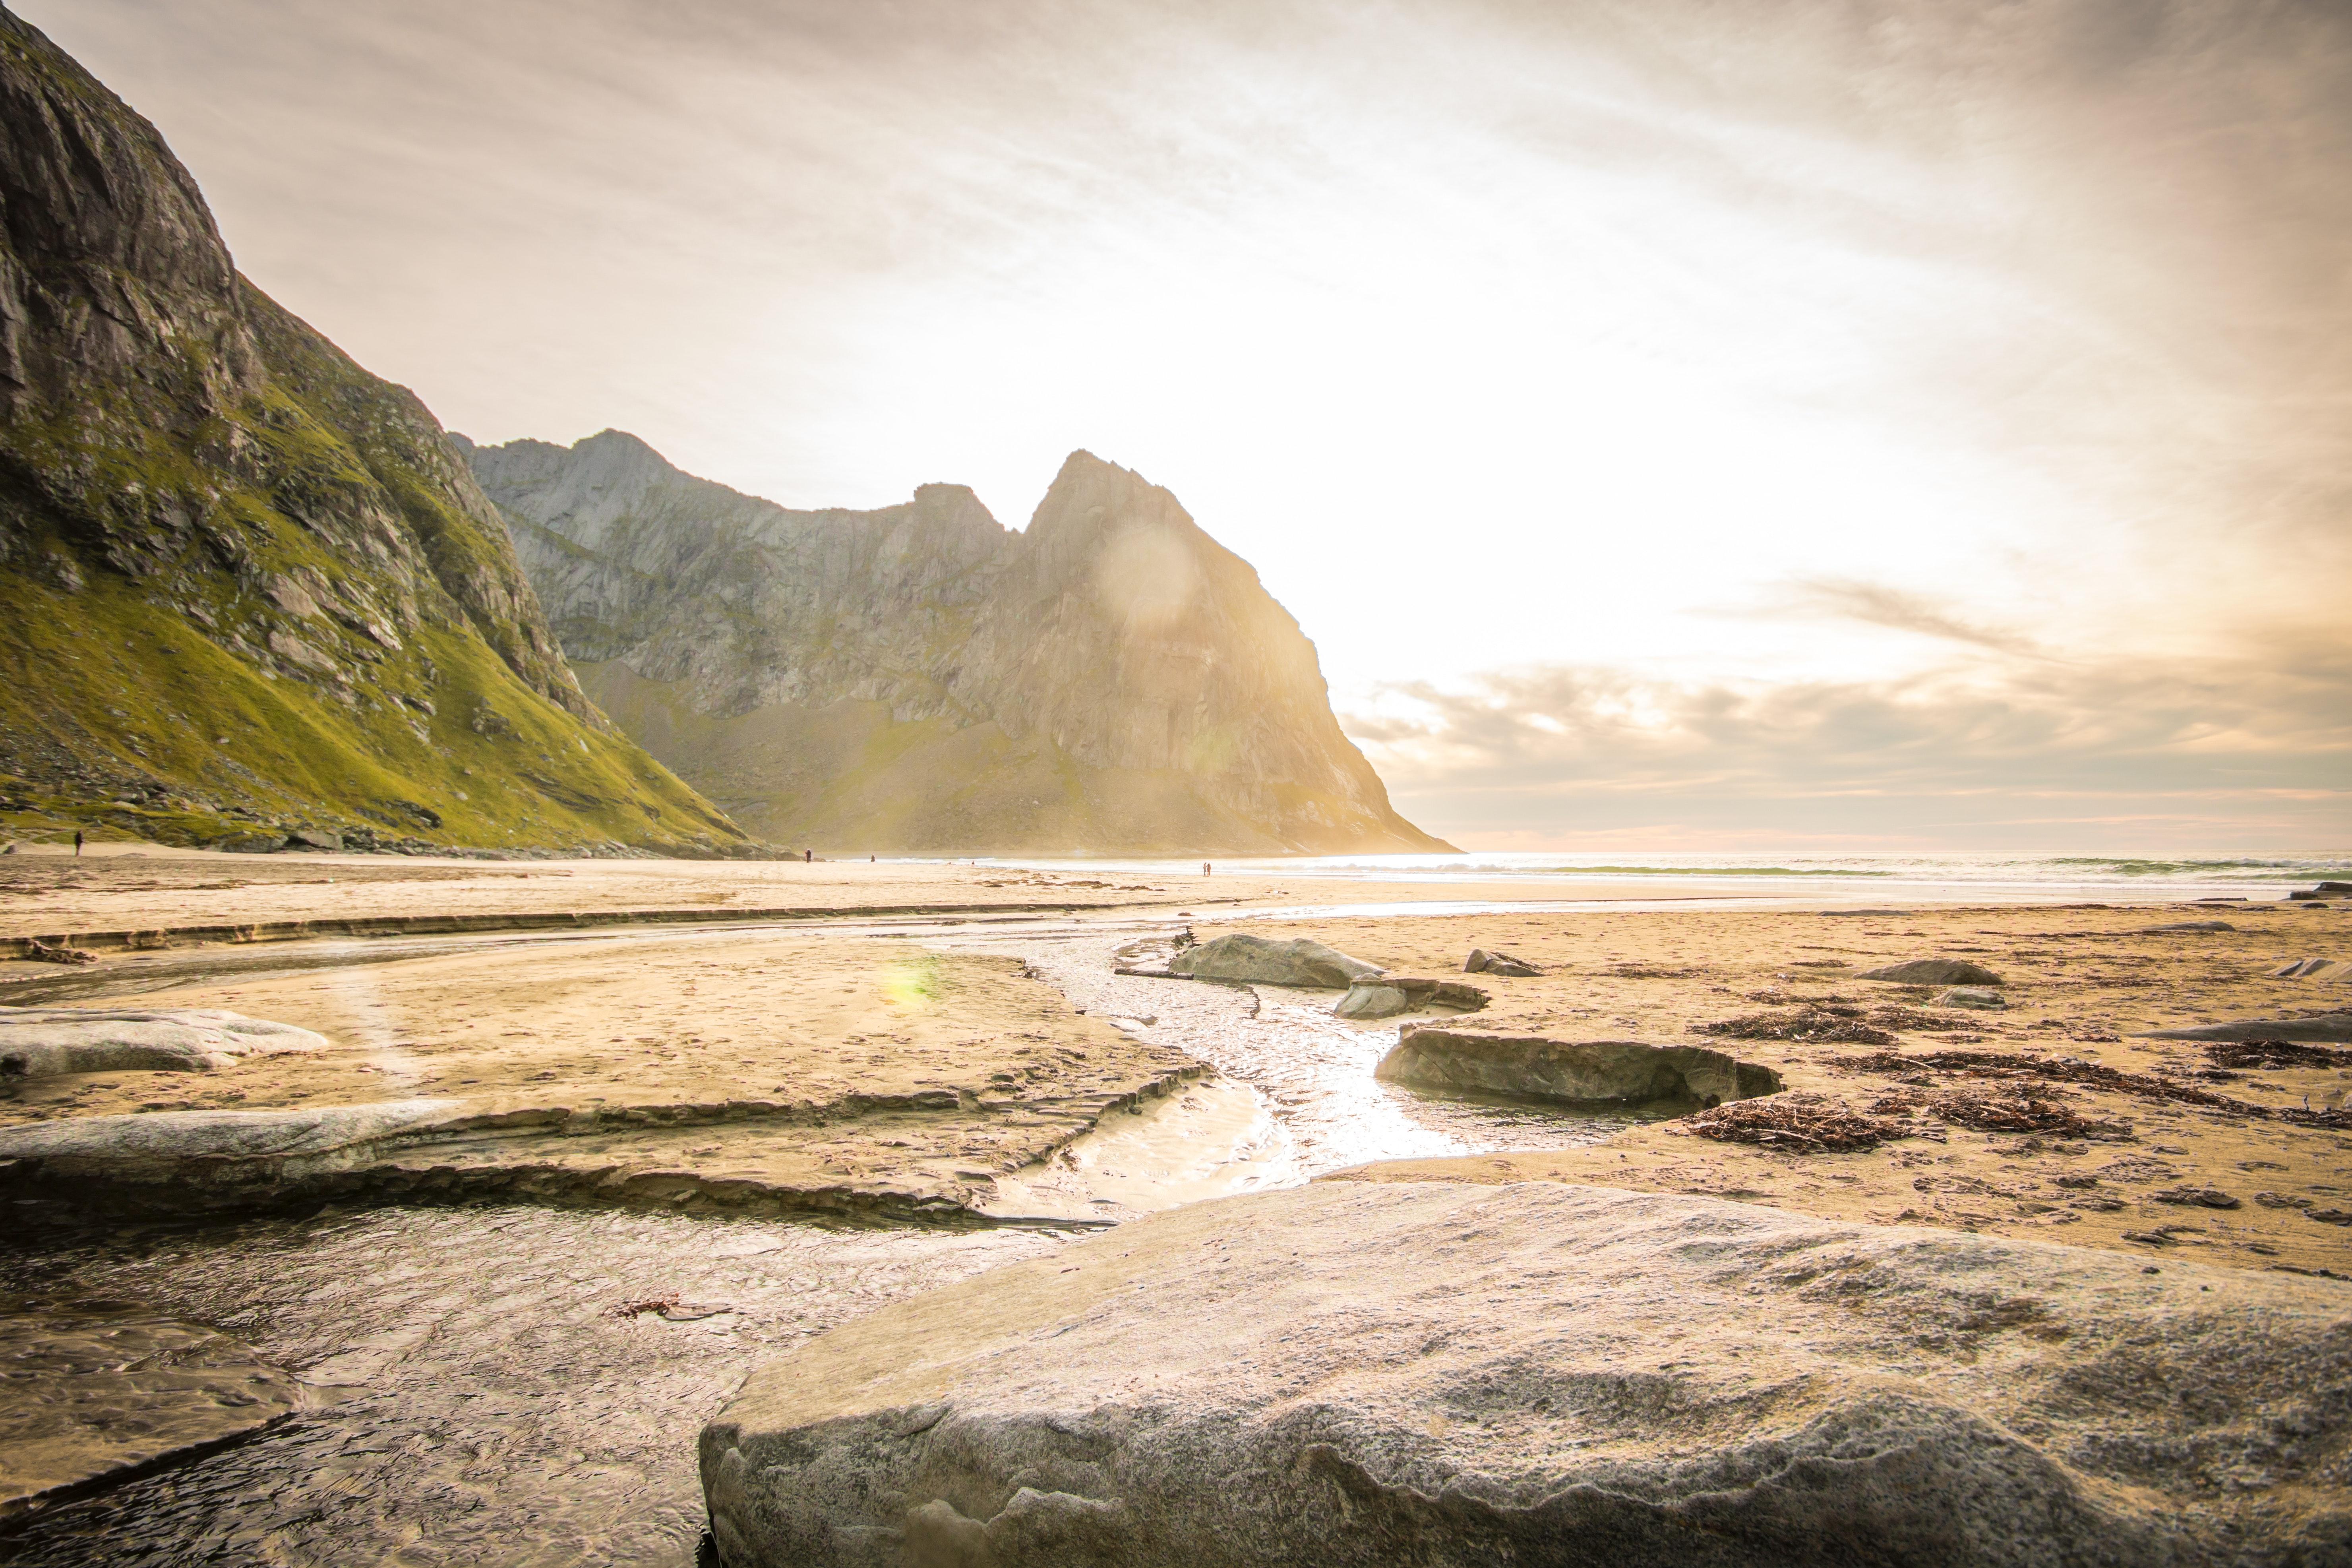 Free Images 4k Wallpaper Beach Calm Environment Hd